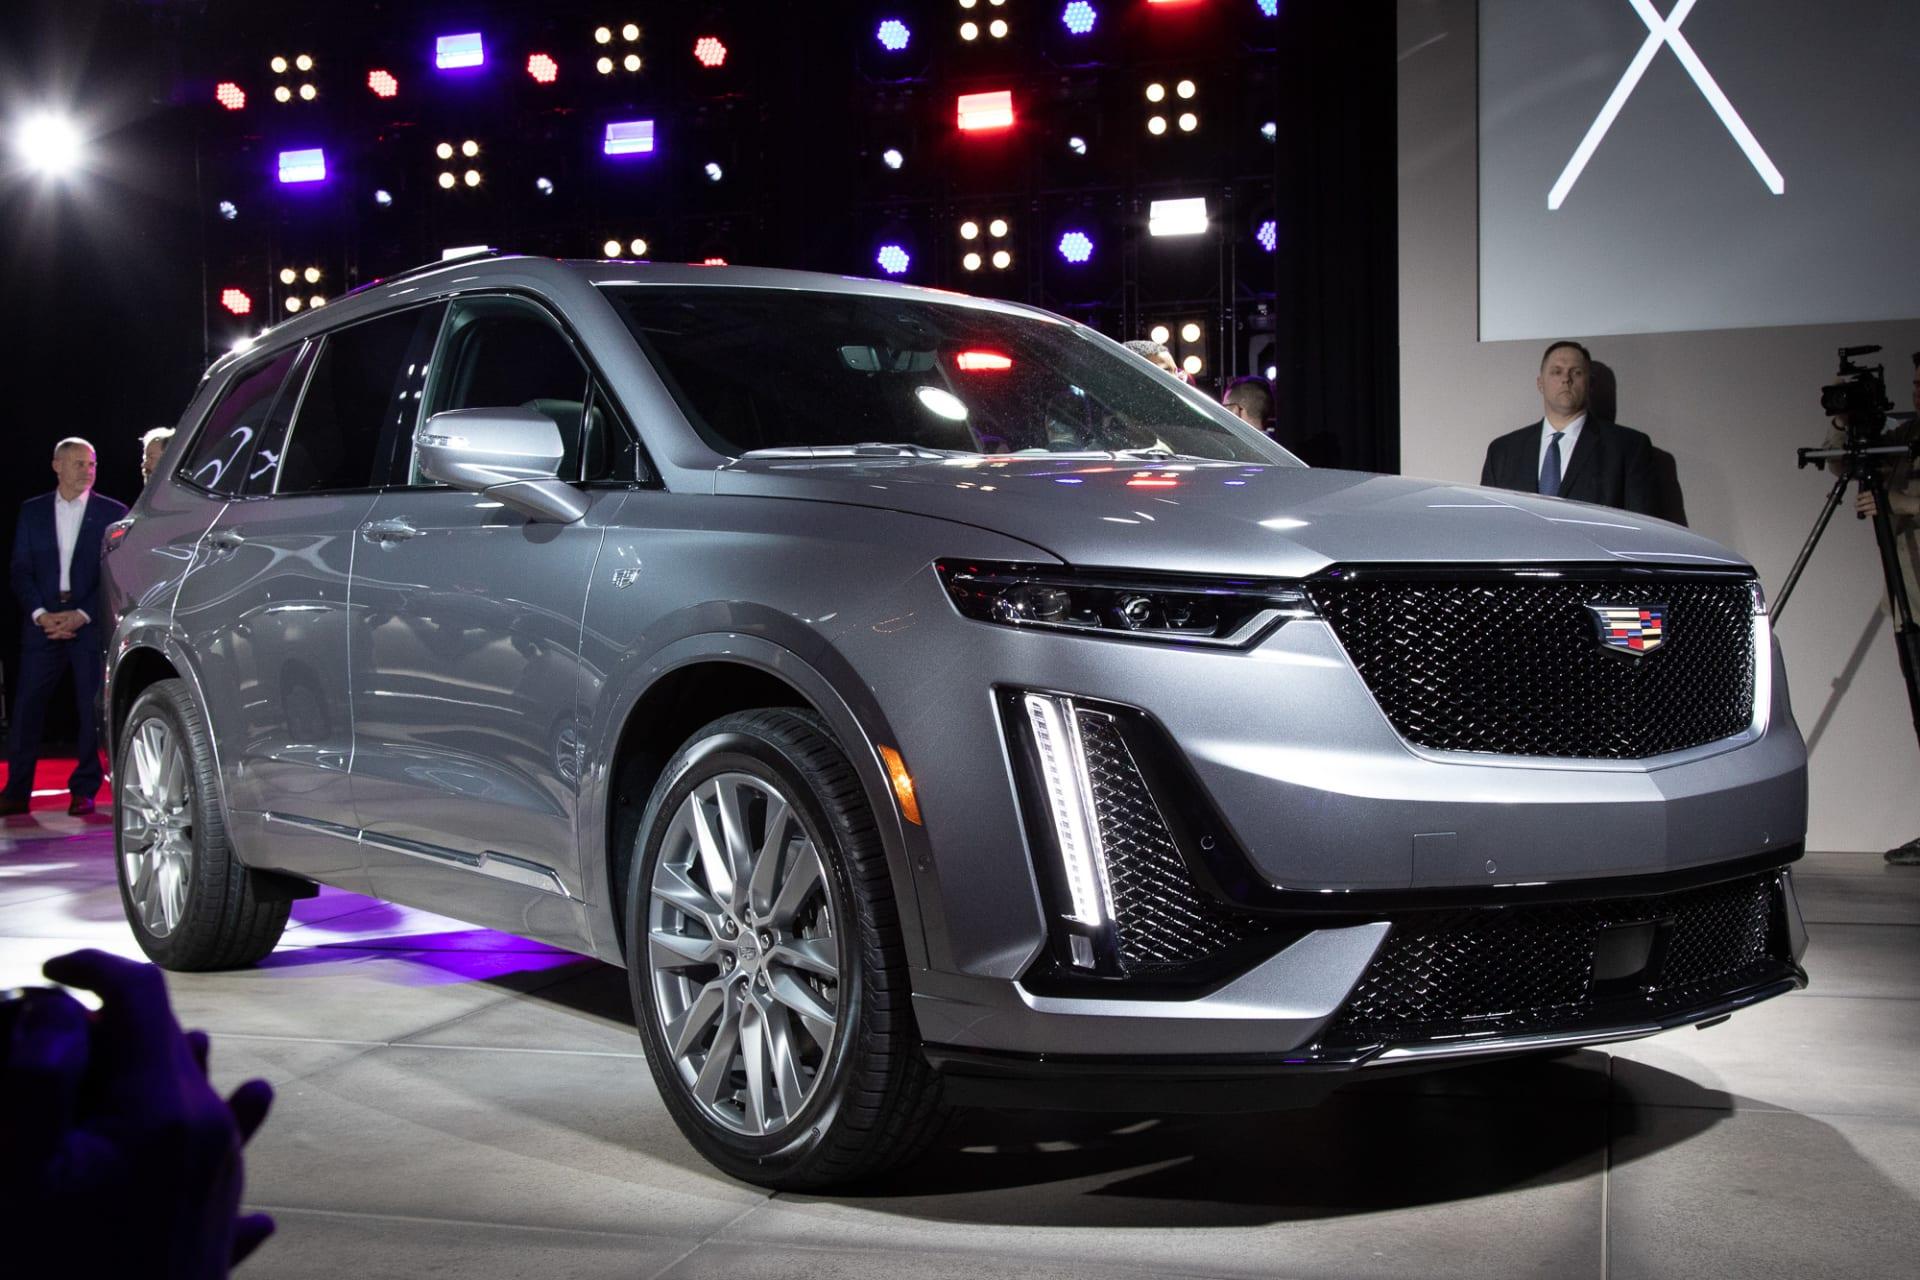 69 New 2020 Cadillac Suv Lineup Exterior and Interior with 2020 Cadillac Suv Lineup